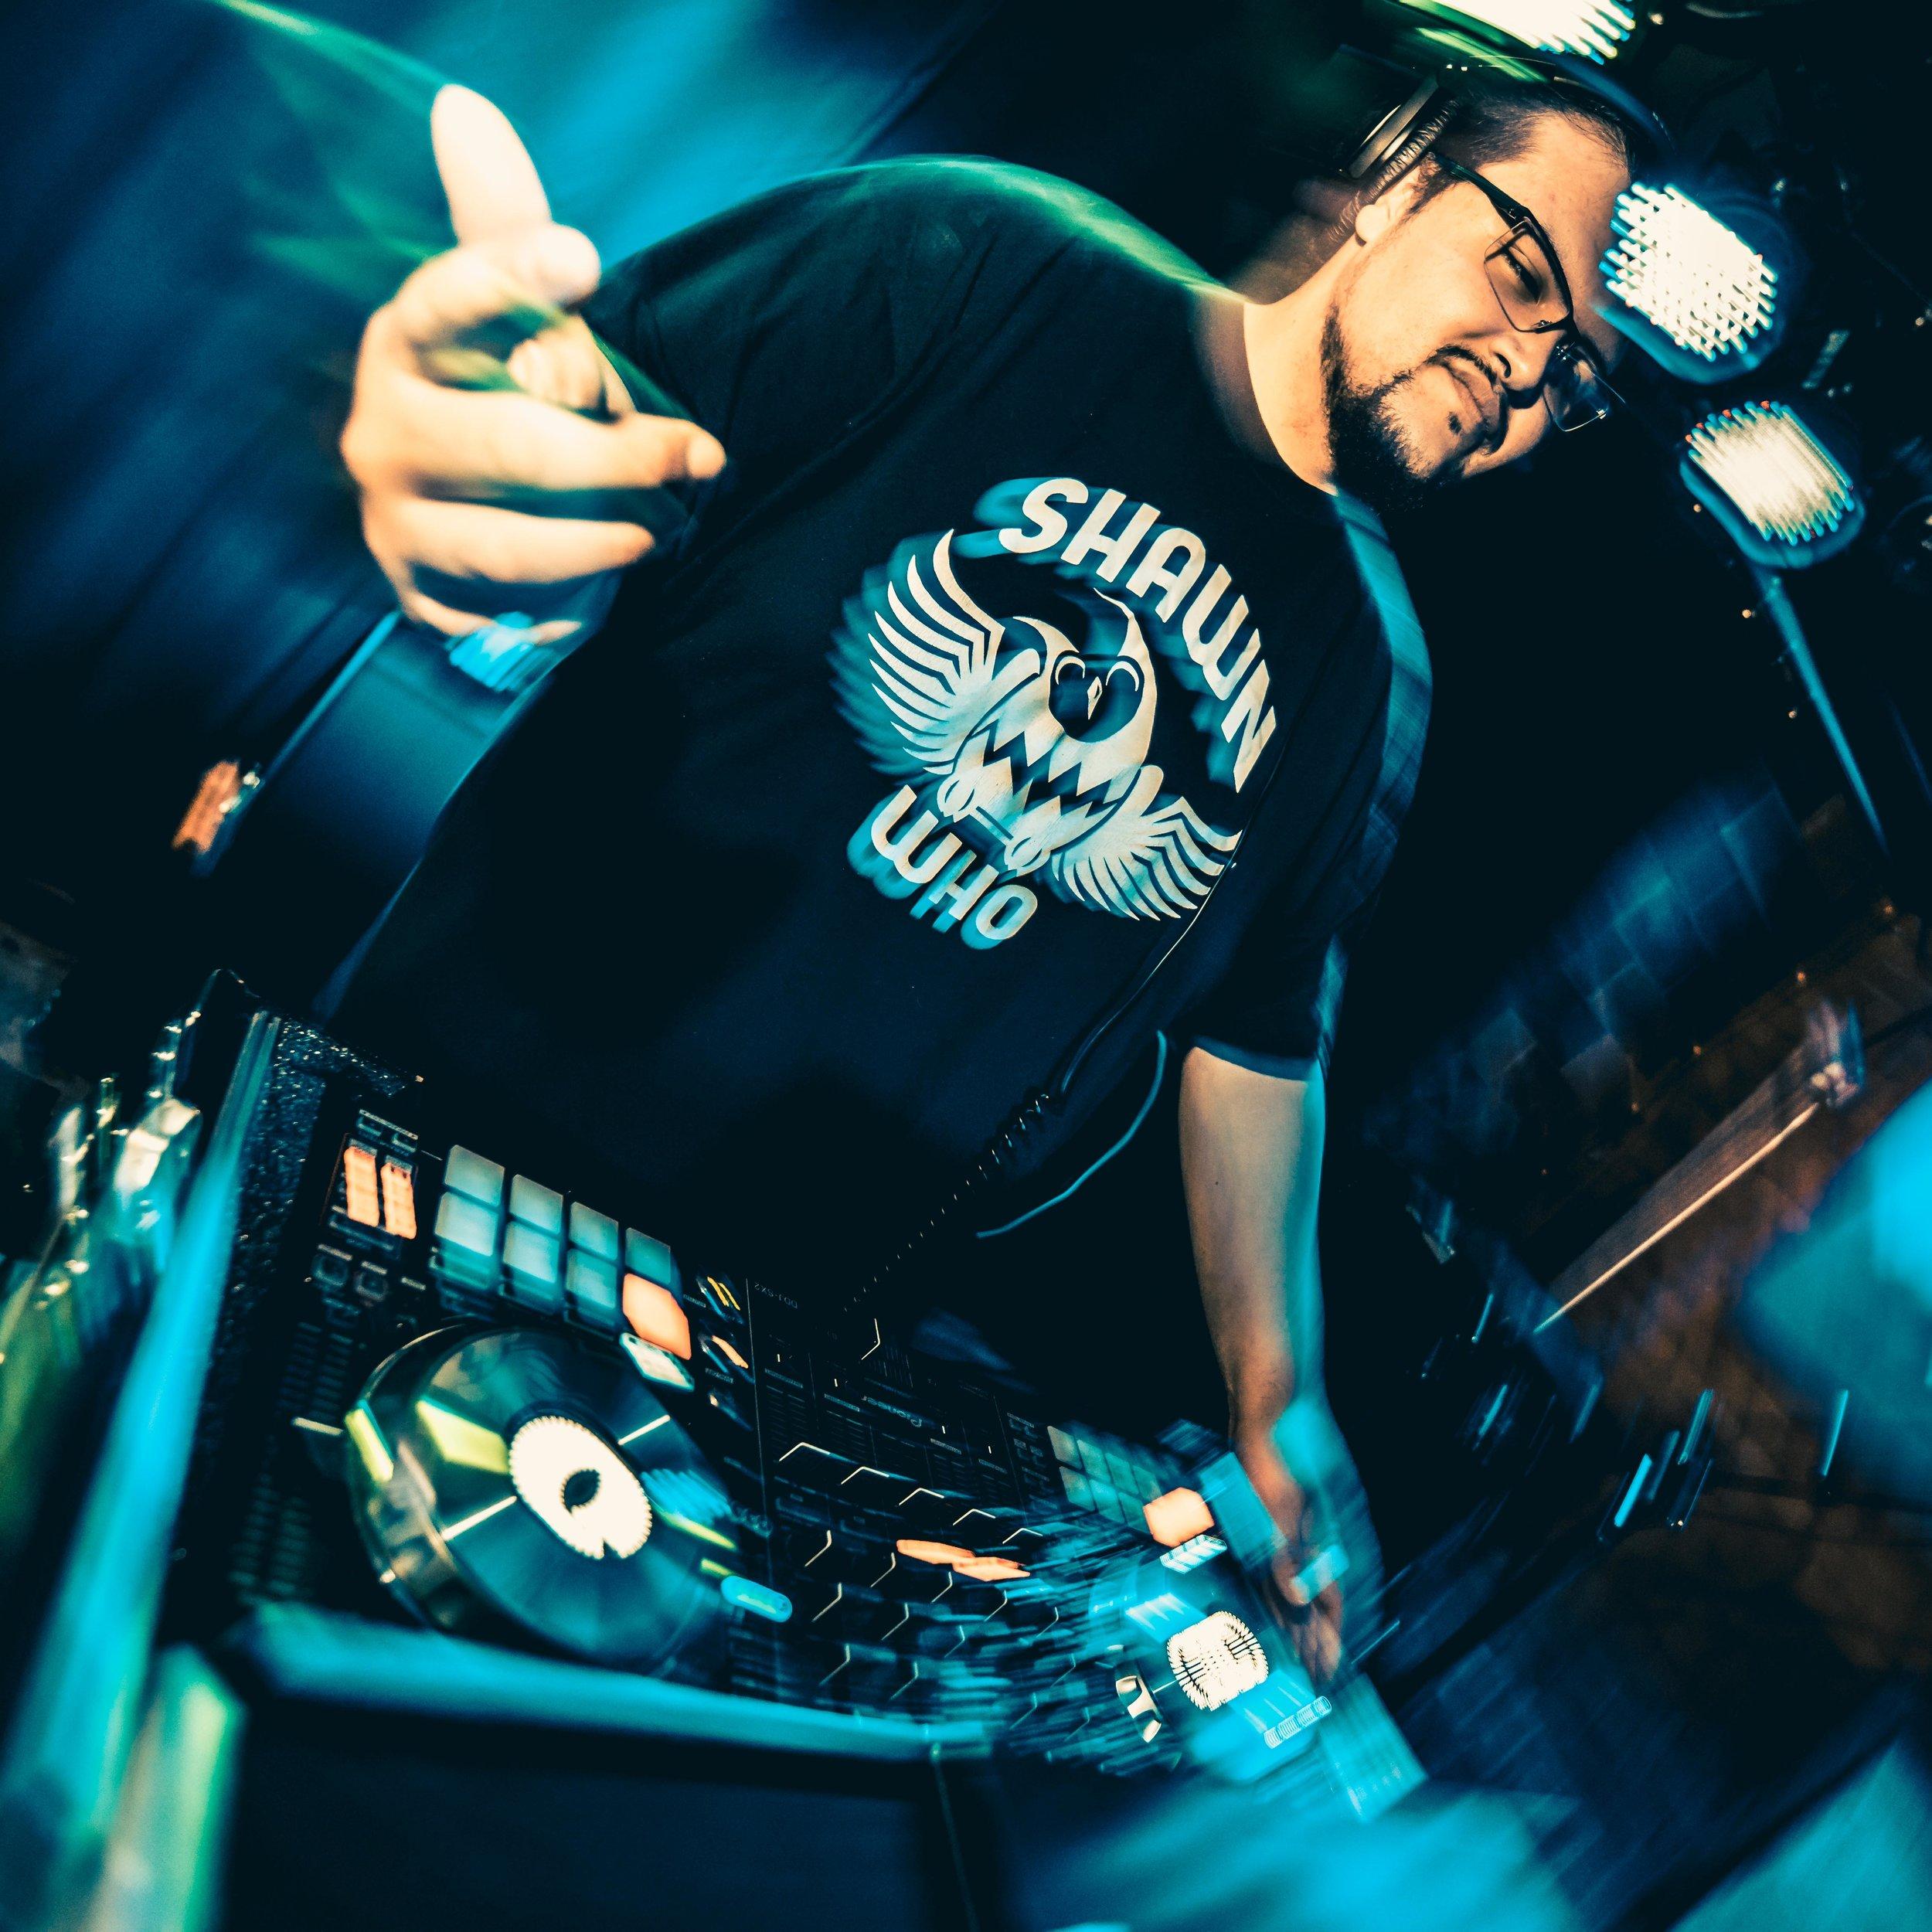 DJ Shawn Who